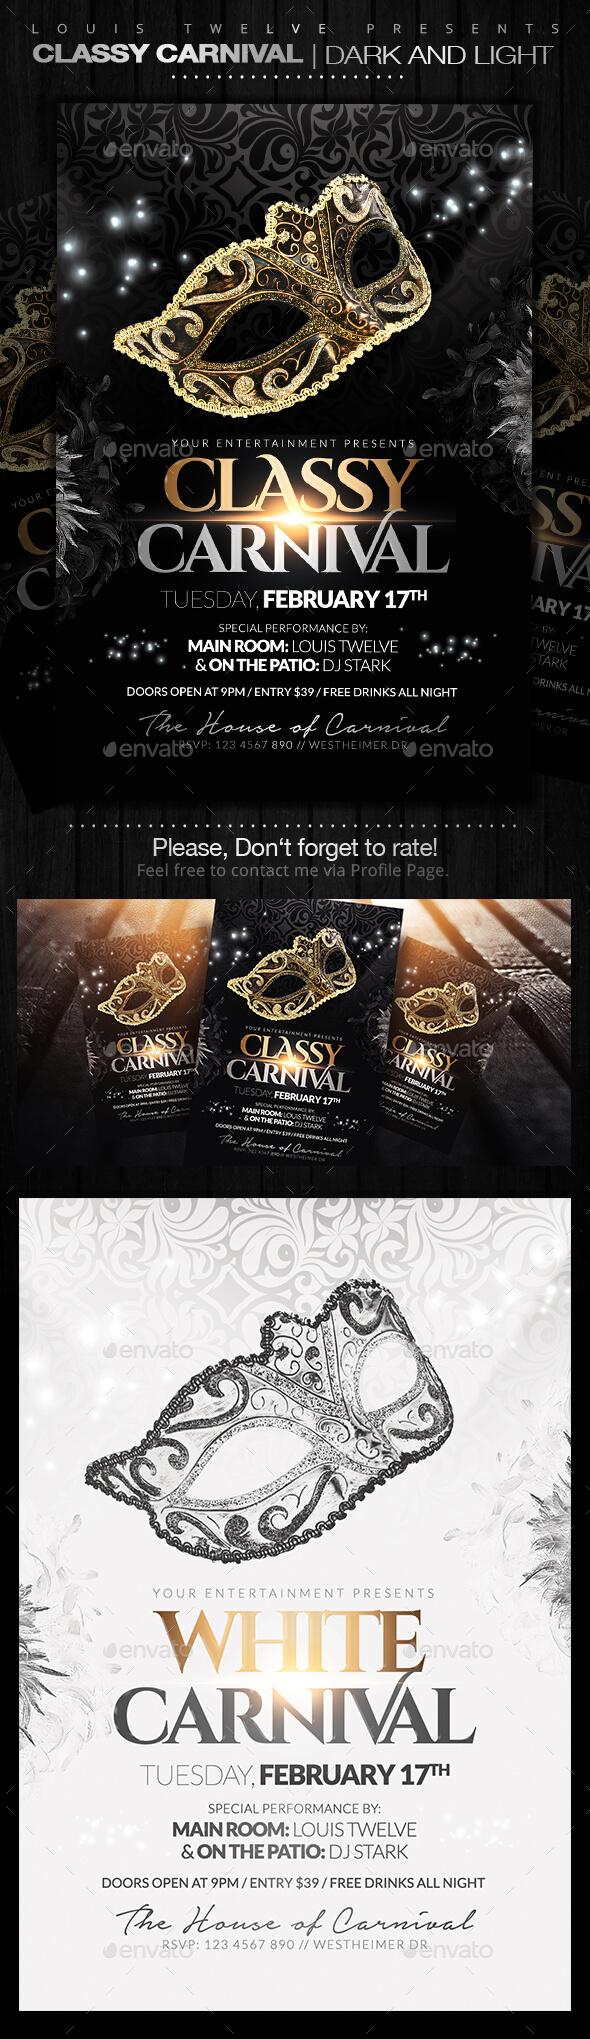 GraphicRiver Classy Carnival or Masquerade Ball Flyers 9984794